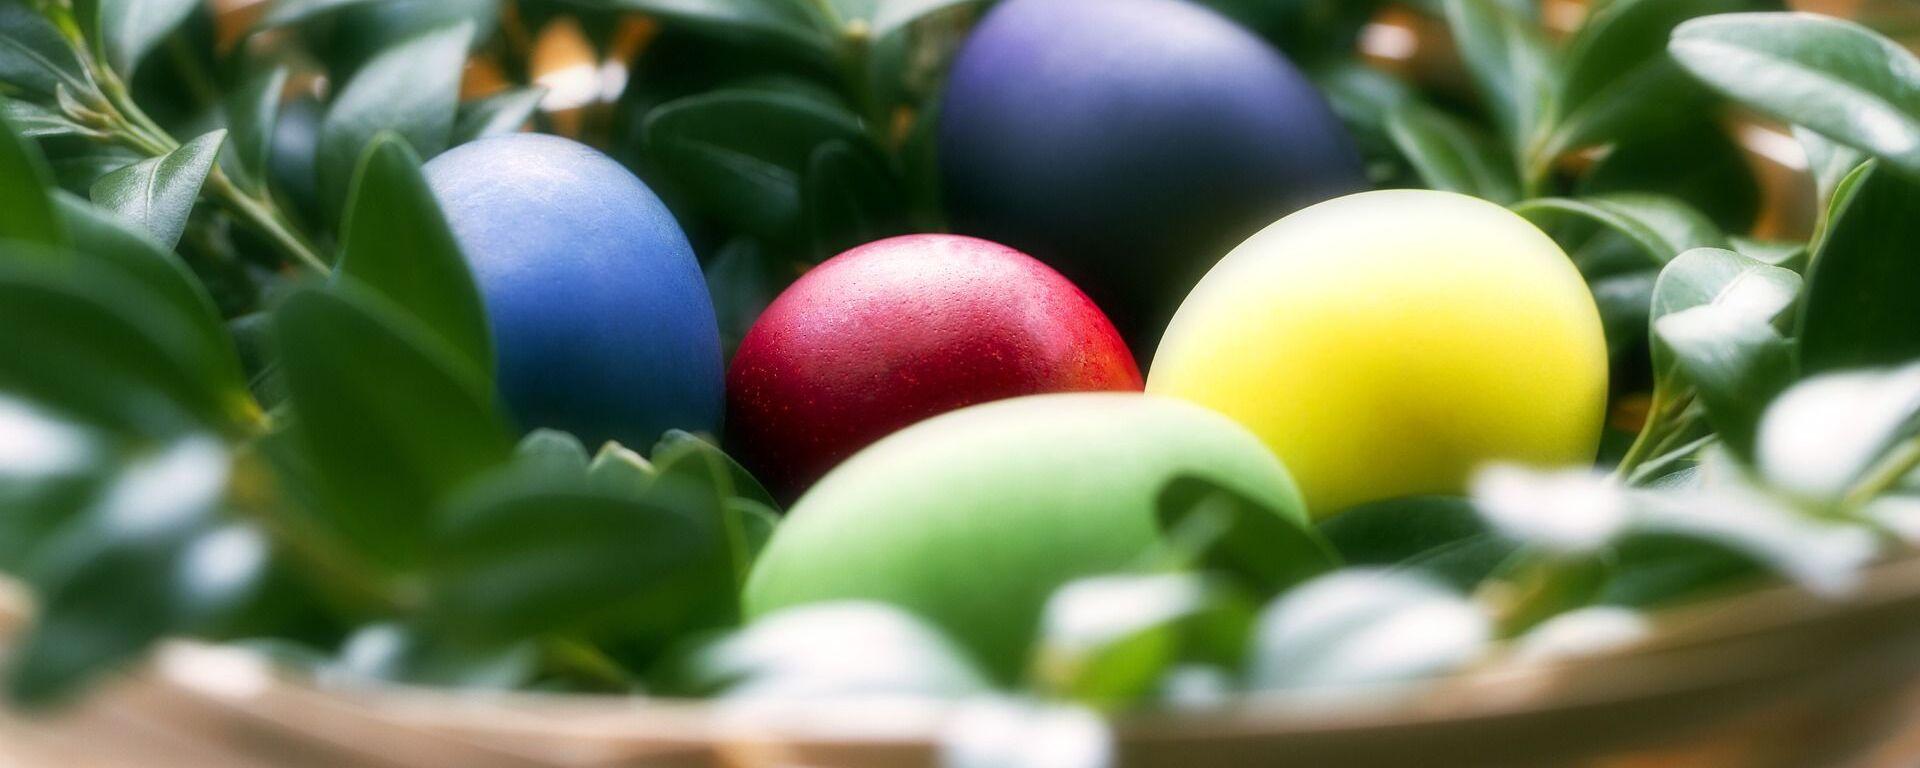 Крашеные яйца на Пасху - Sputnik Таджикистан, 1920, 21.03.2019